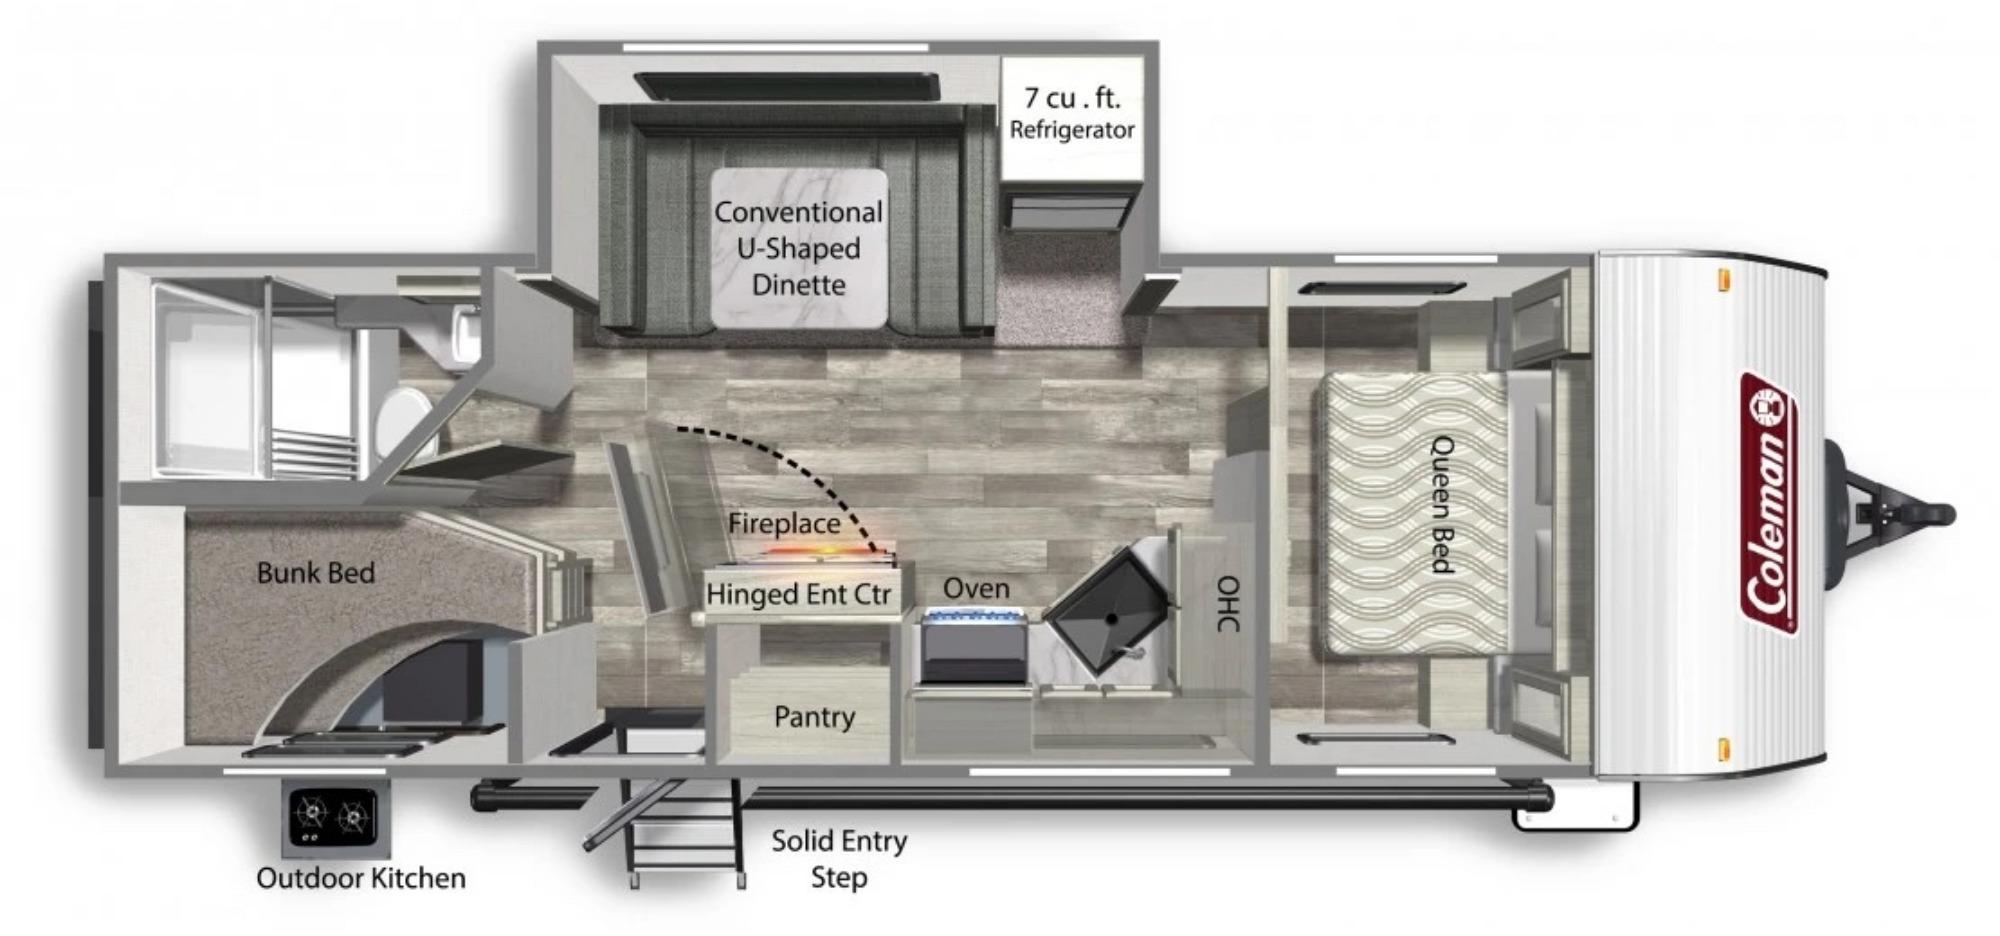 View Floor Plan for 2022 COLEMAN COLEMAN LANTERN 242BHWE